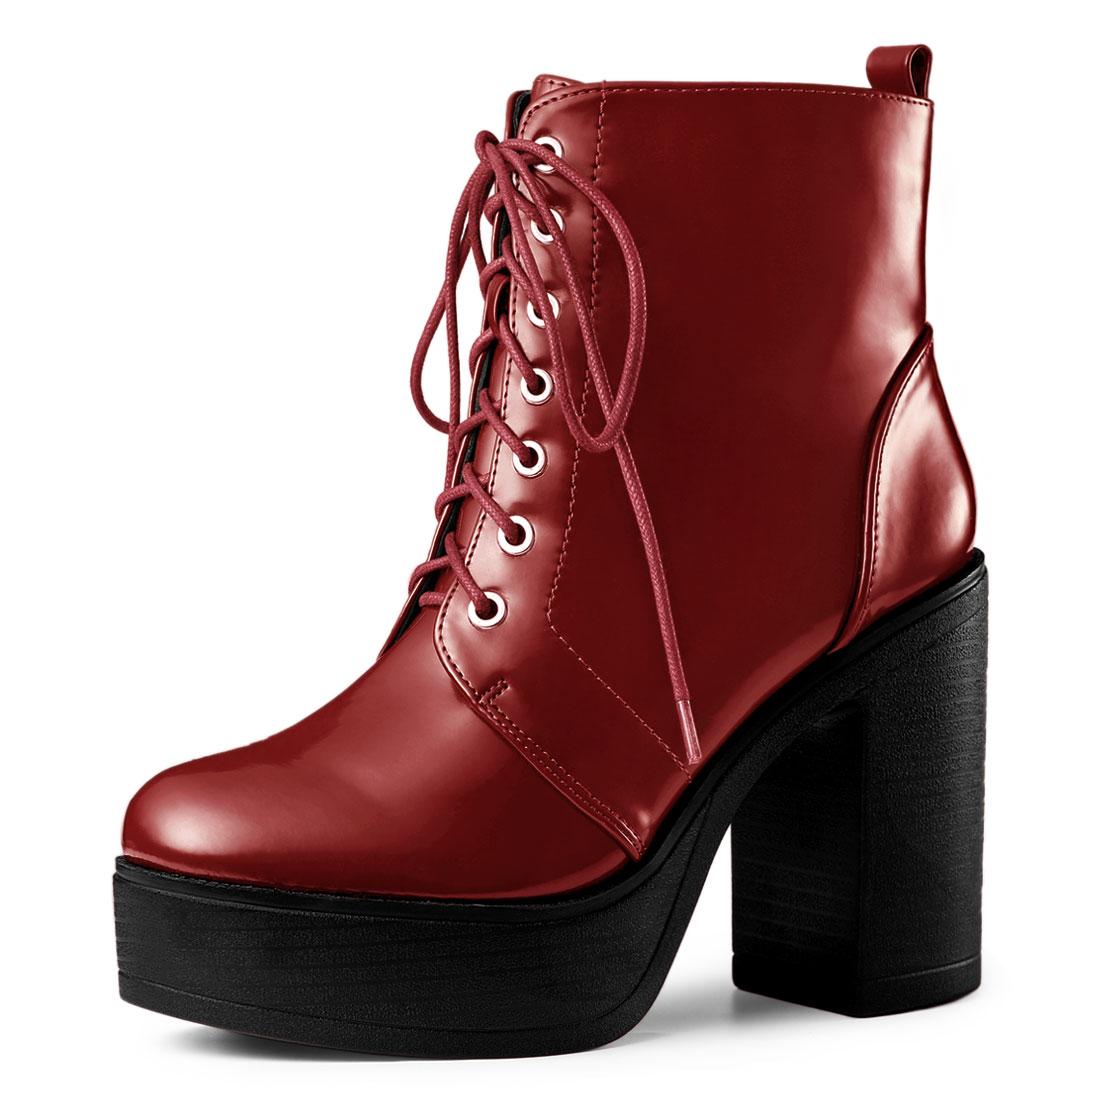 Allegra K Women's Platform Chunky High Heel Lace Up Combat Boots Red US 9